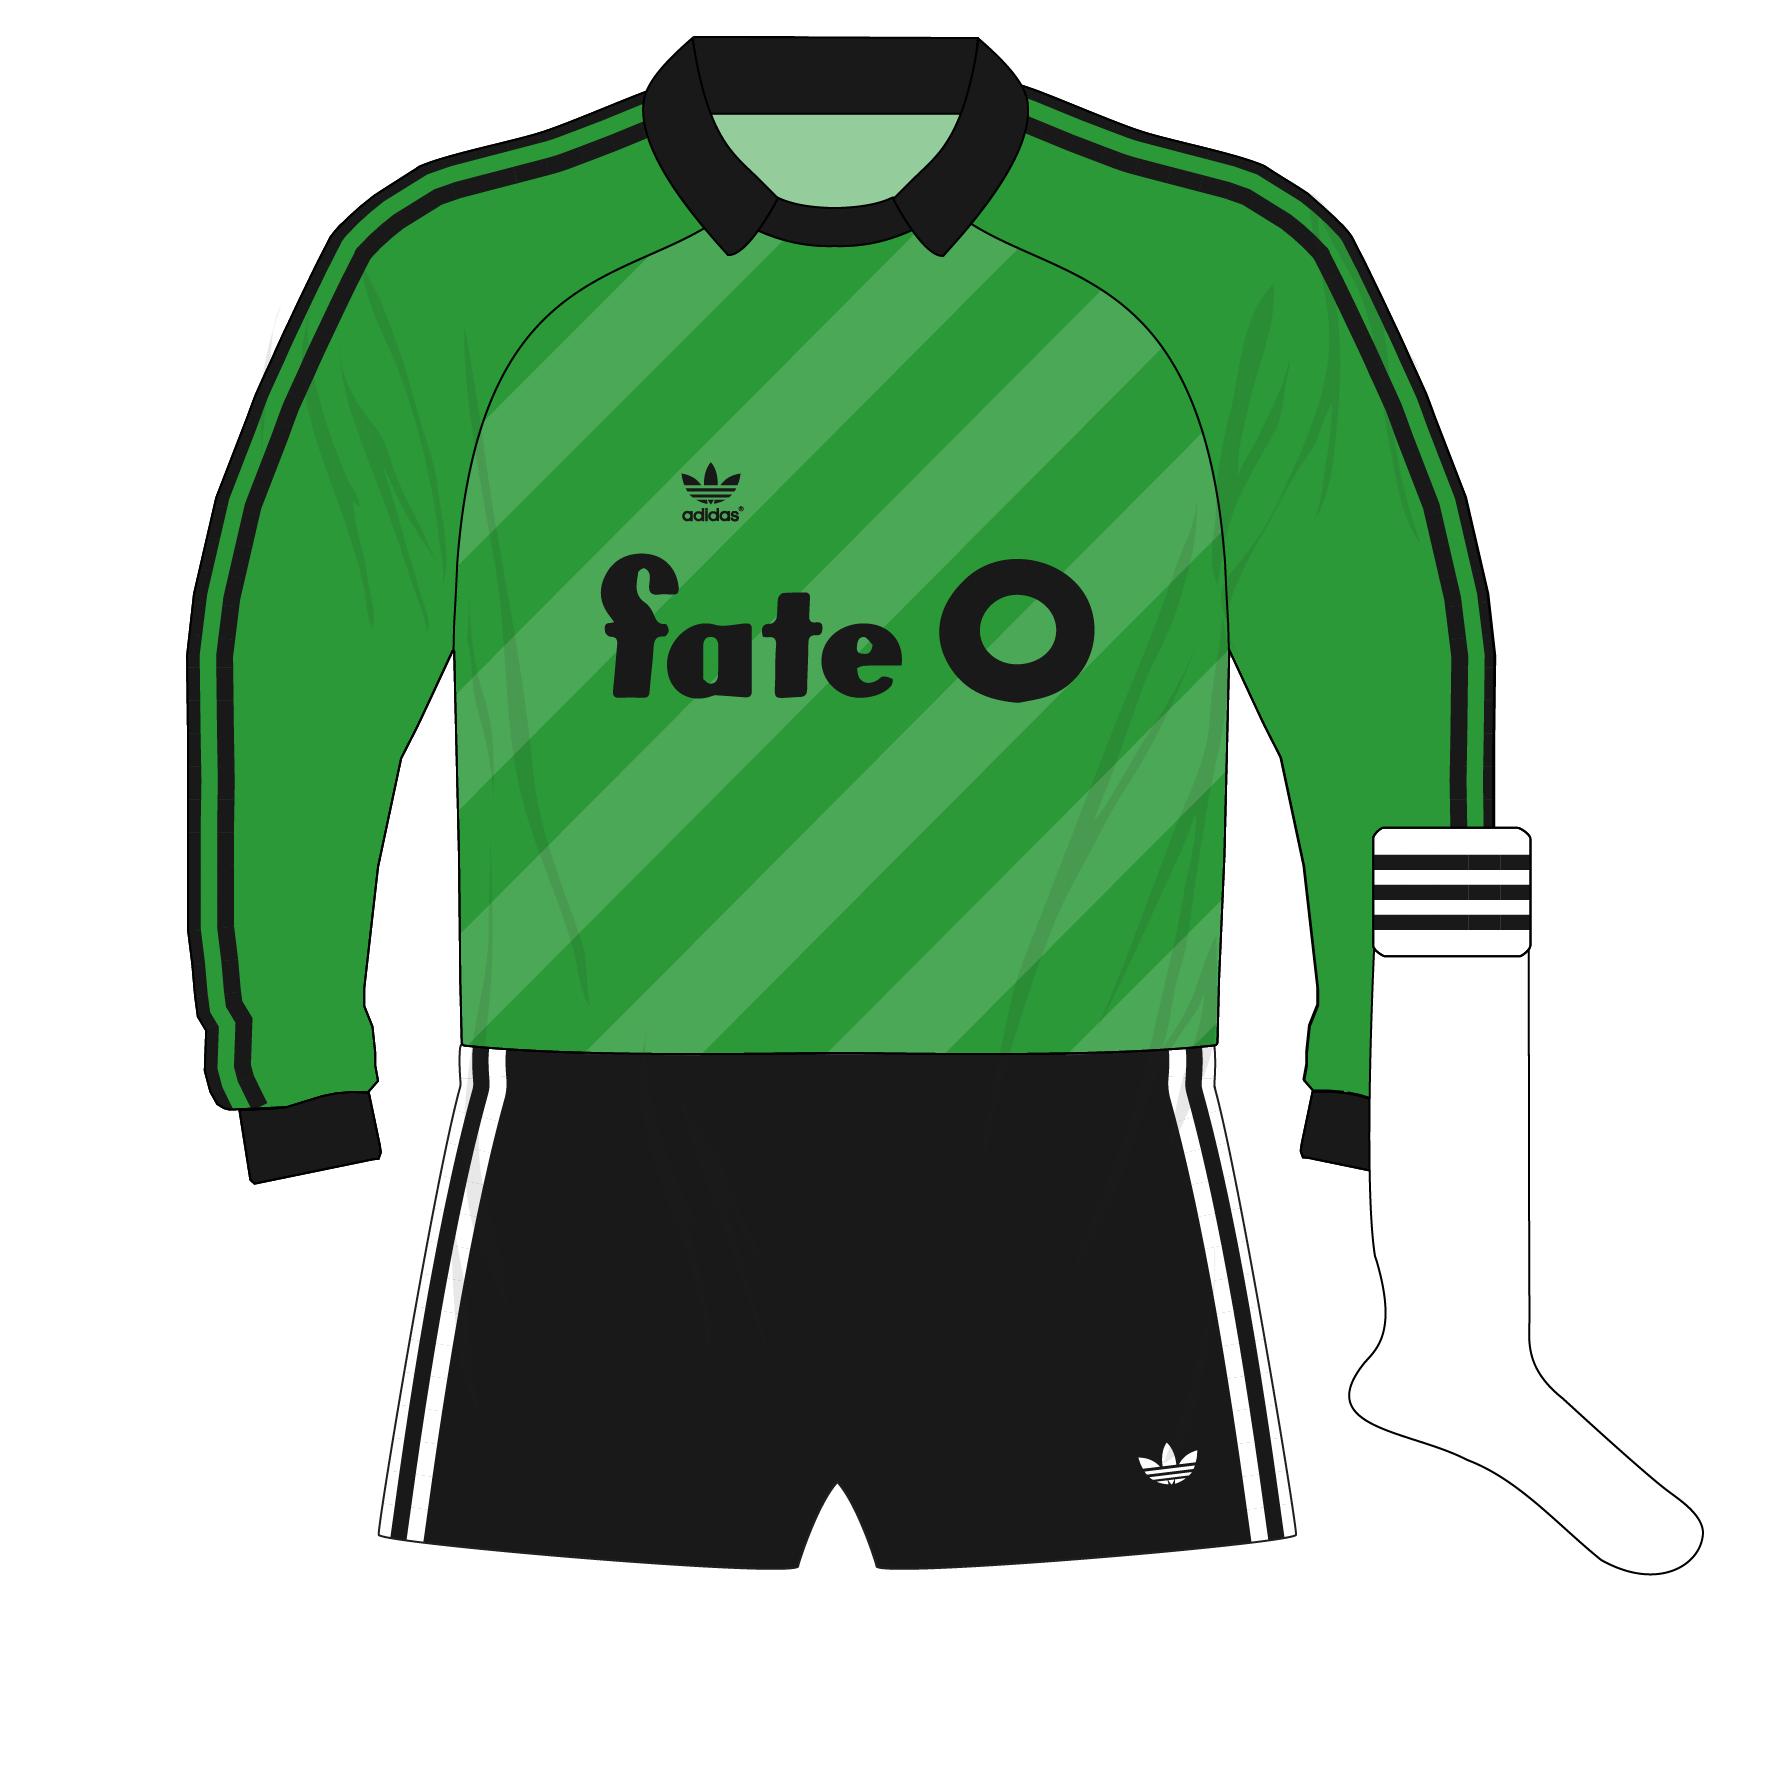 7596e1ad31a The evolution of adidas goalkeeper shirt designs – part 3 – Museum of  Jerseys